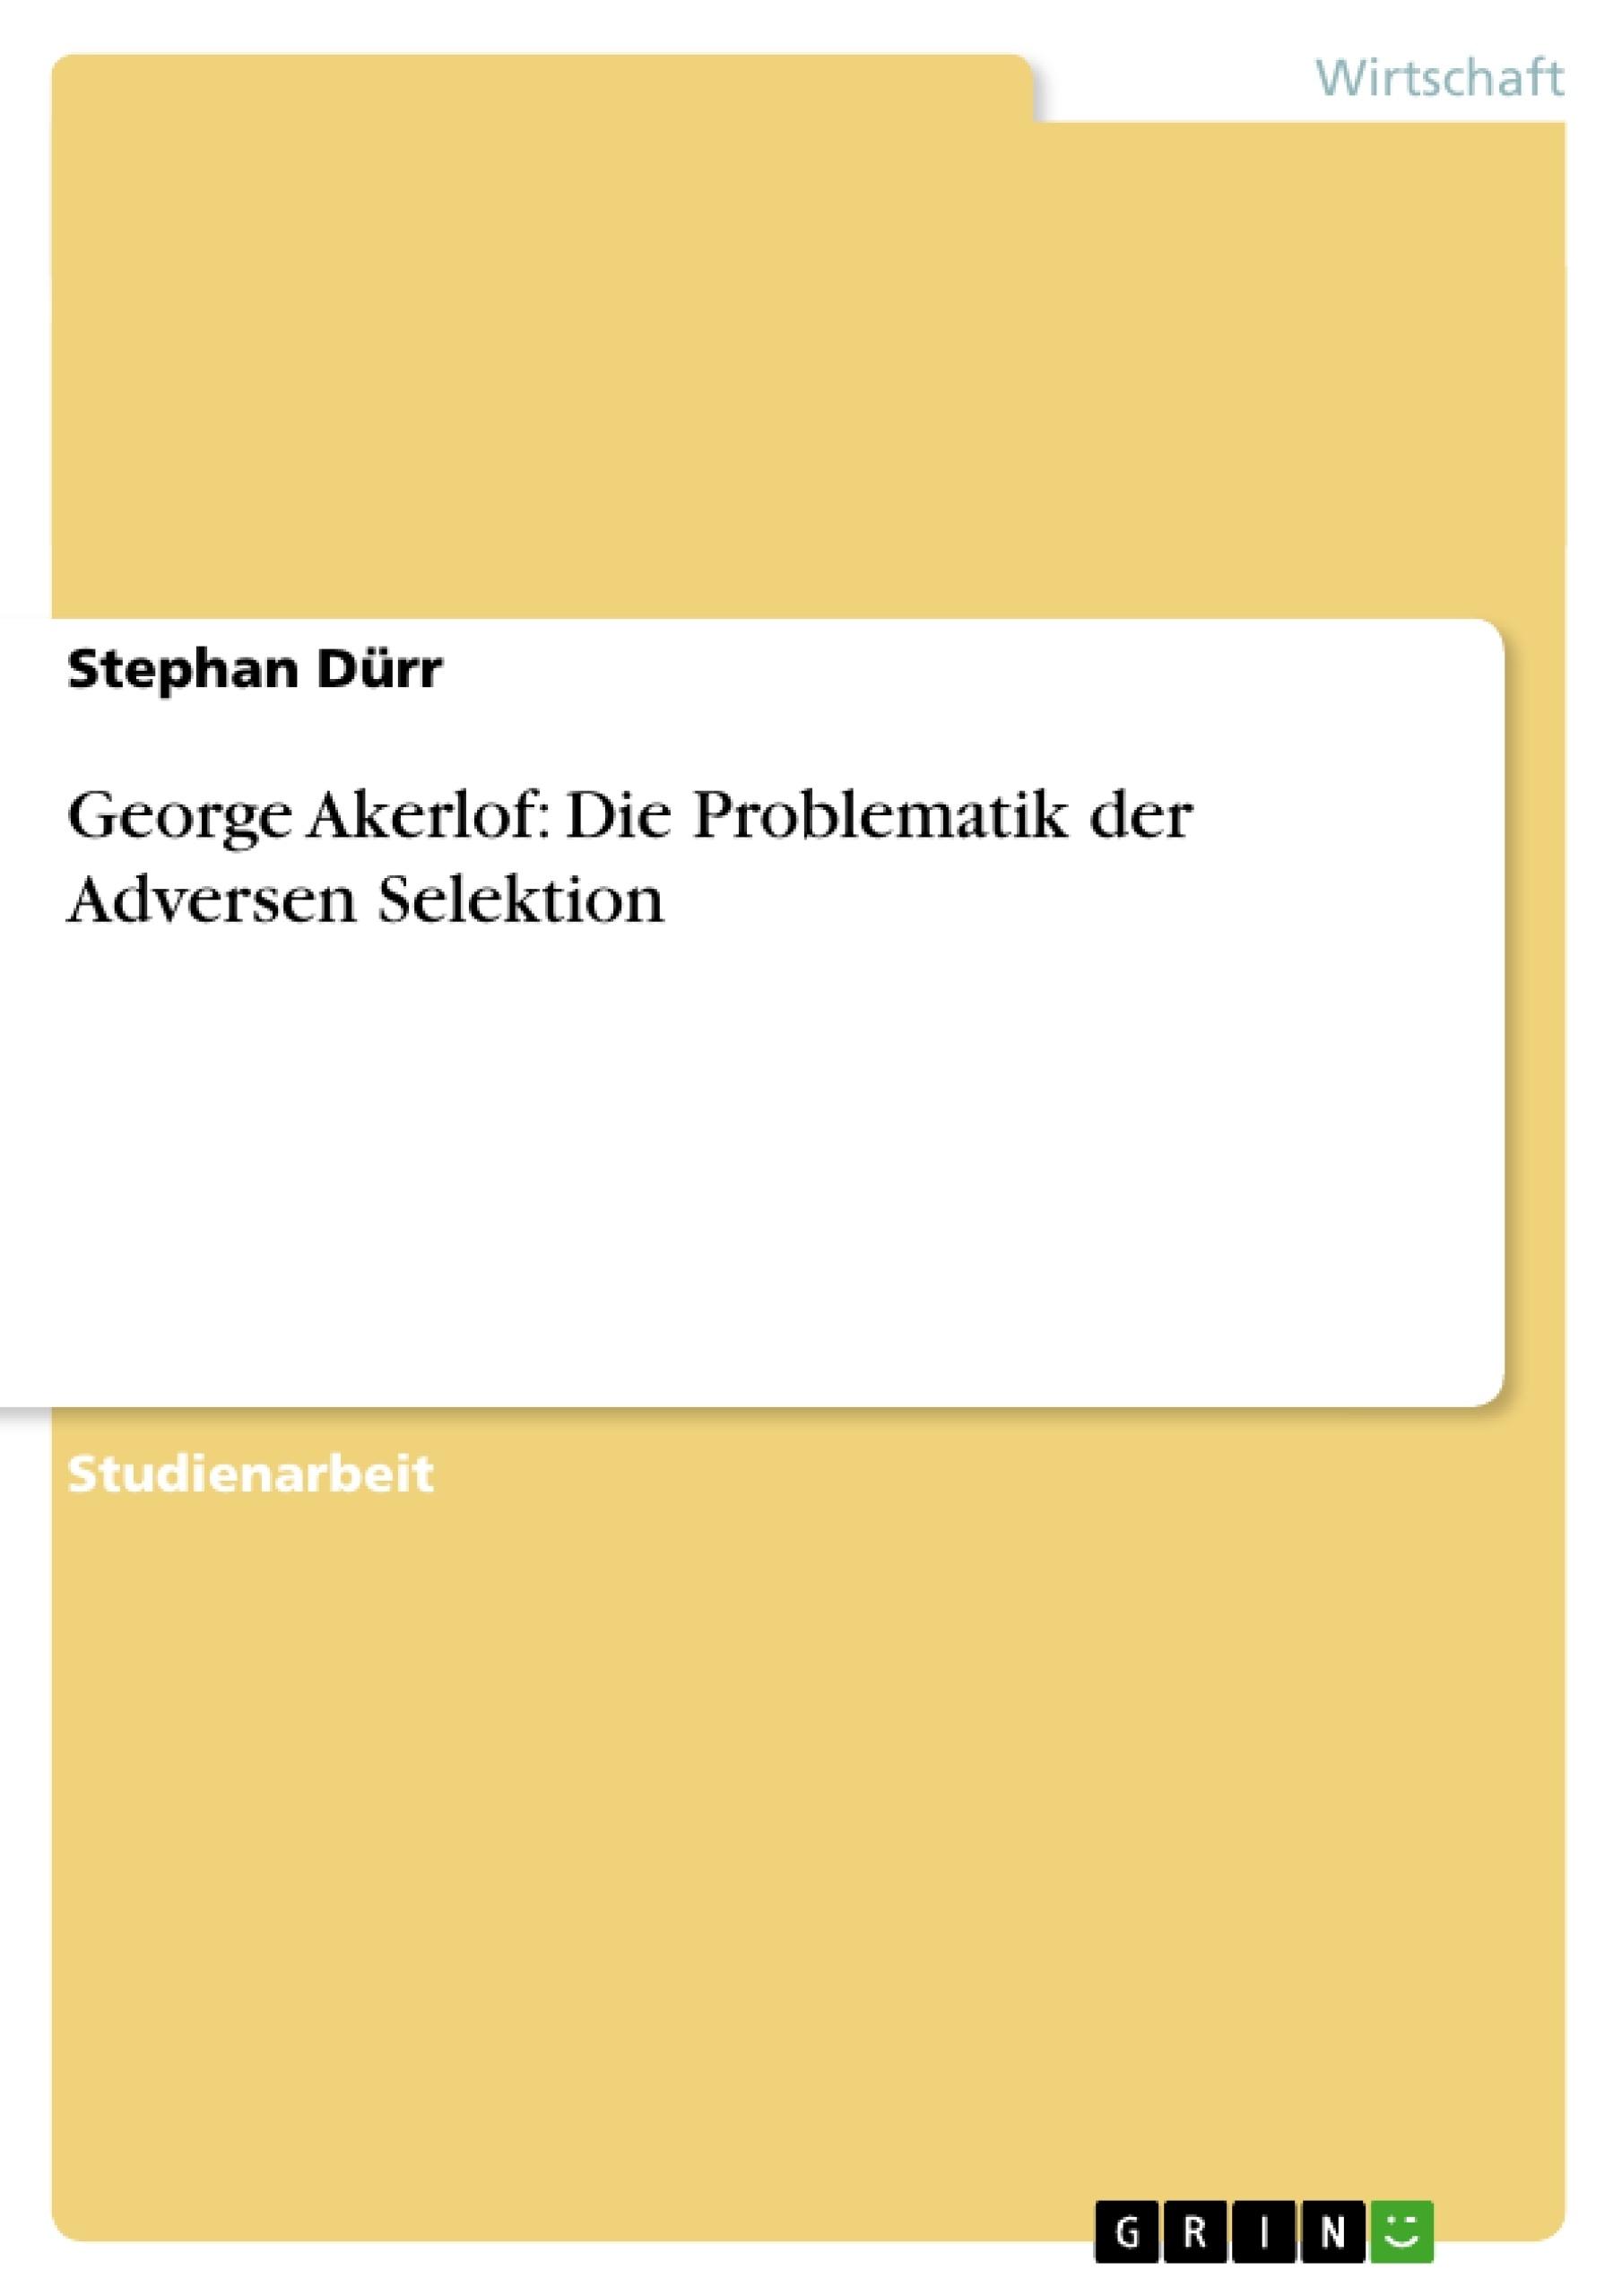 Titel: George Akerlof: Die Problematik der Adversen Selektion